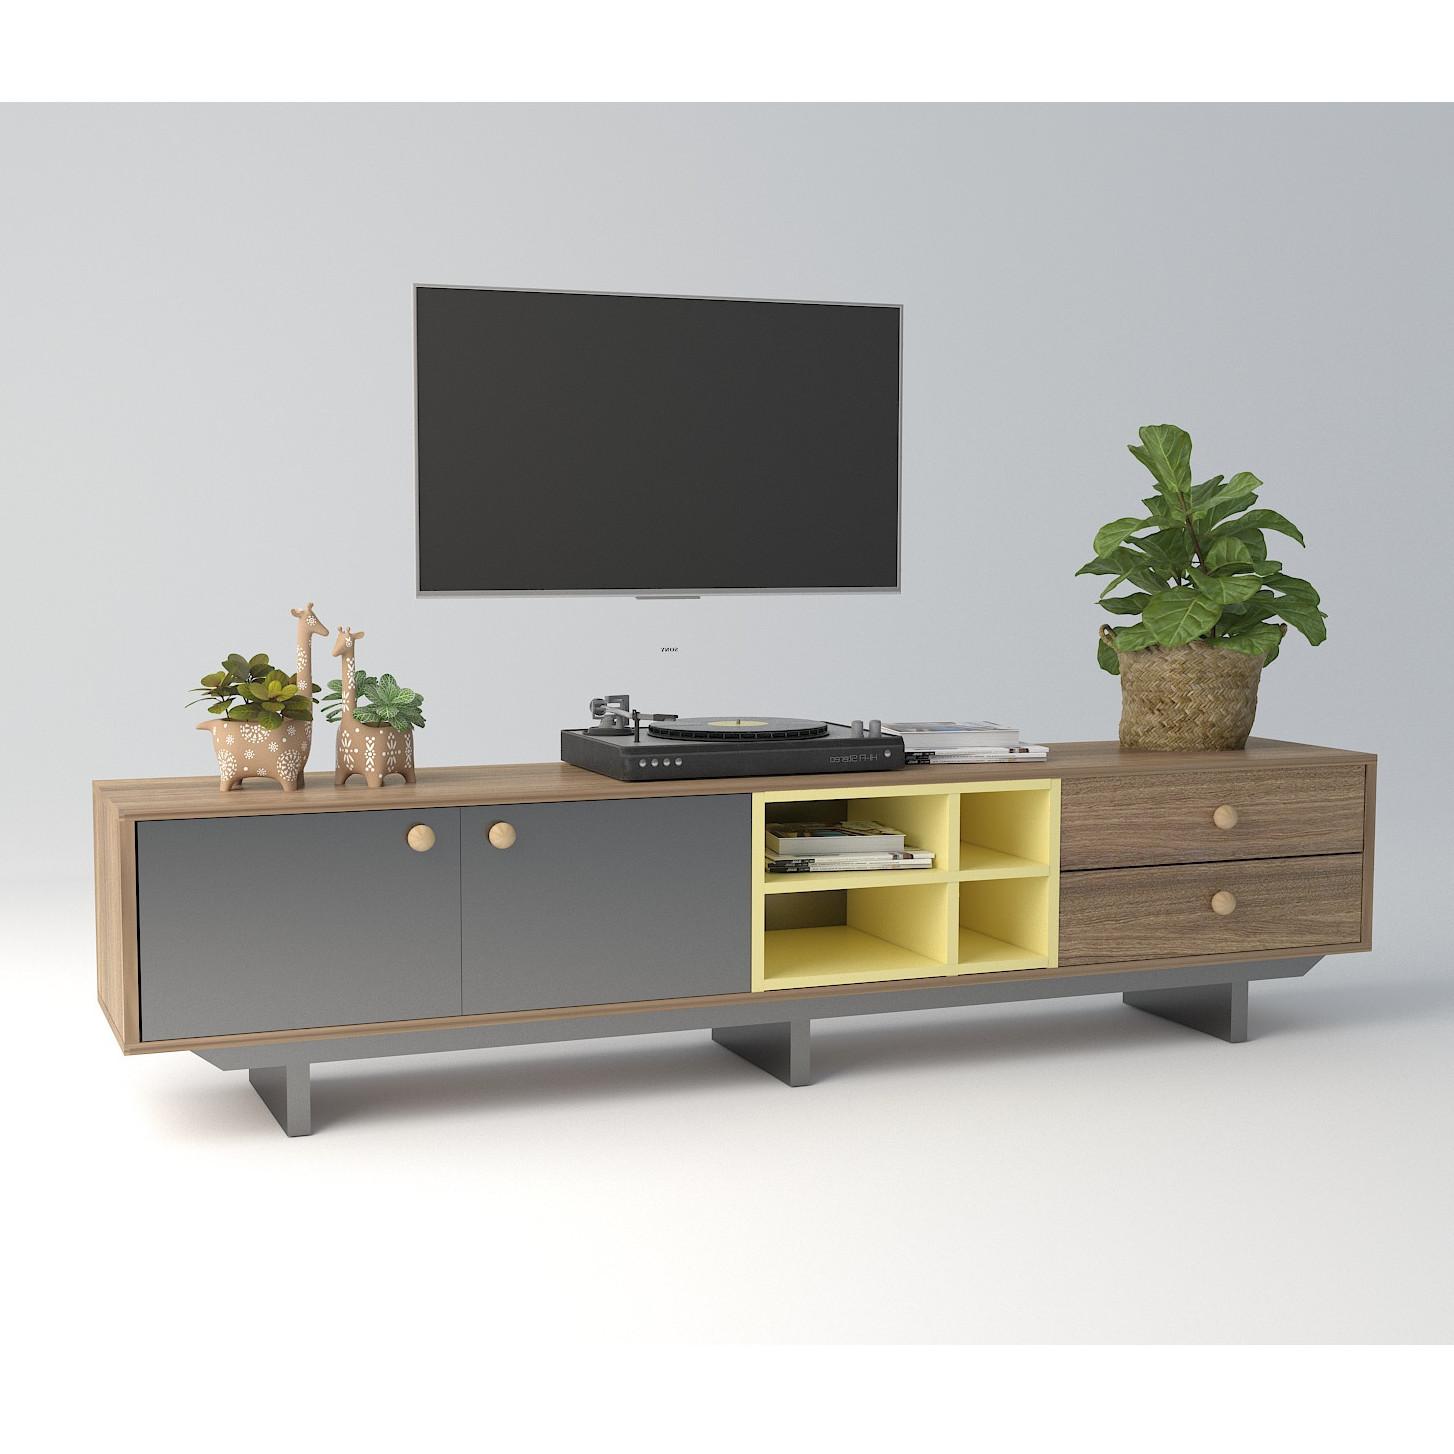 Kệ Tivi Măng Furniture KTV001 vật liệu MDF phủ Melamine D1600 x R350 x C450mm